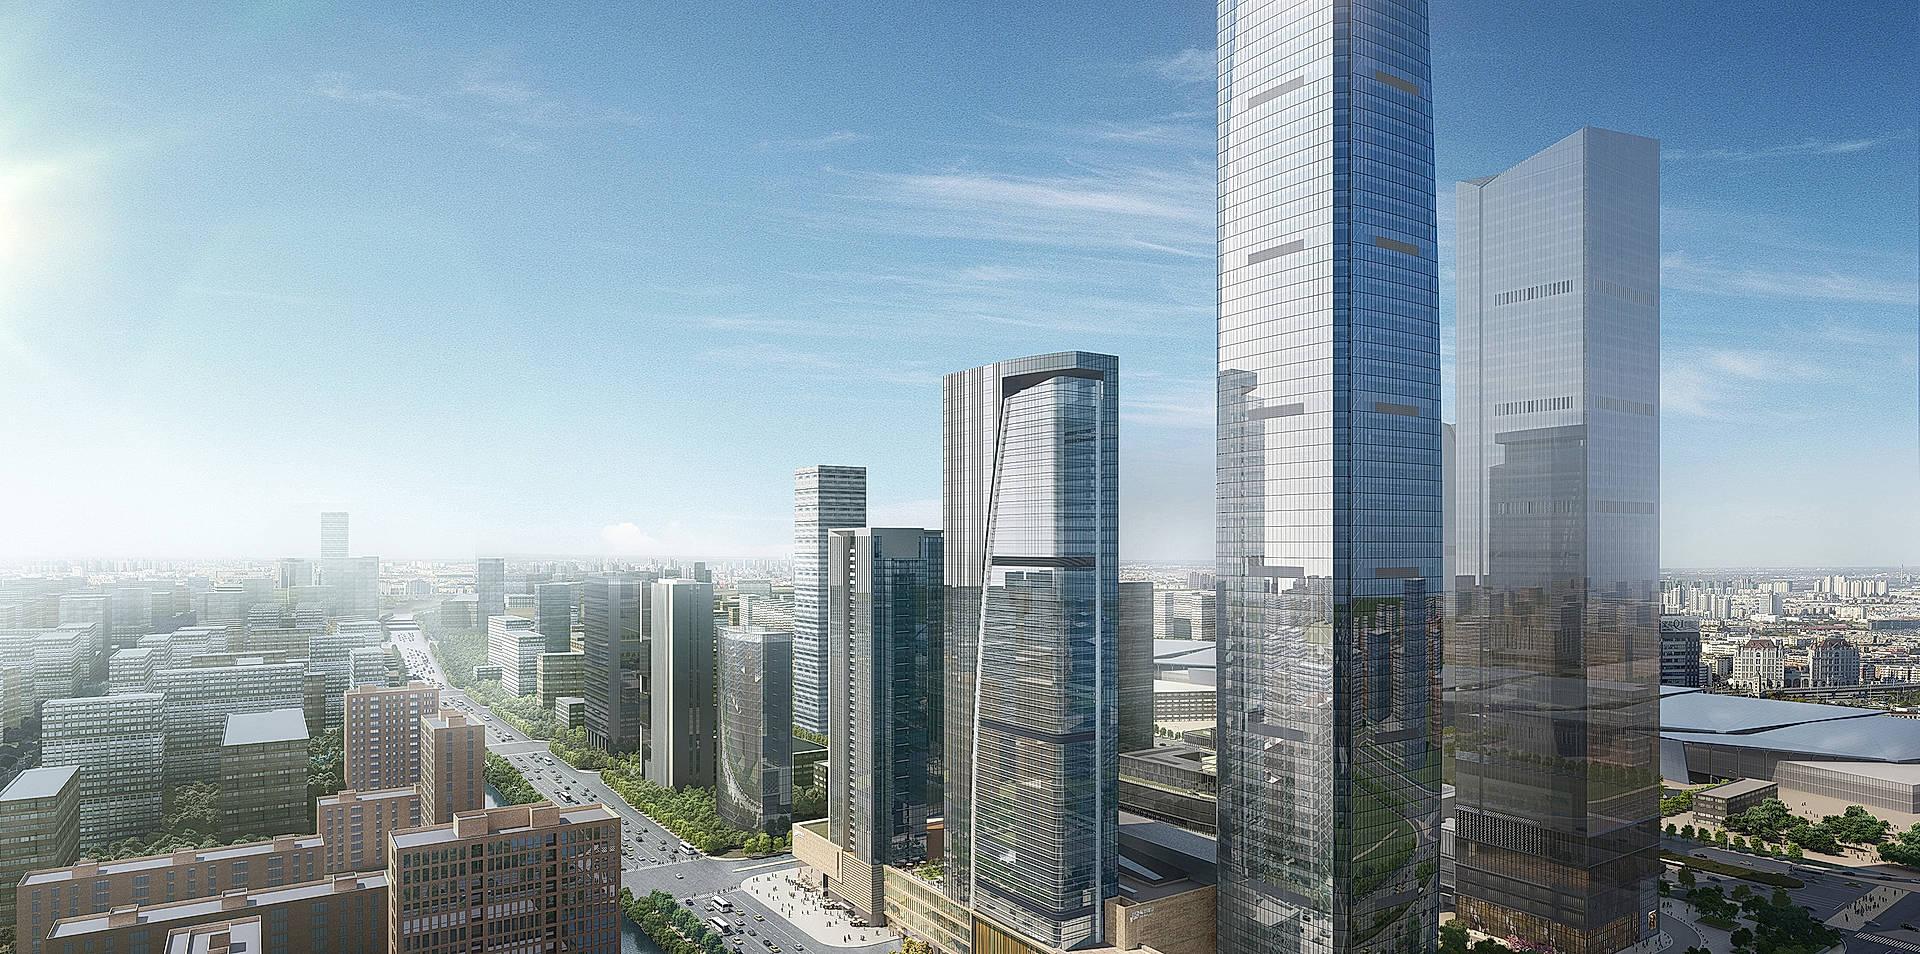 World Trade Center, Nanjing, China